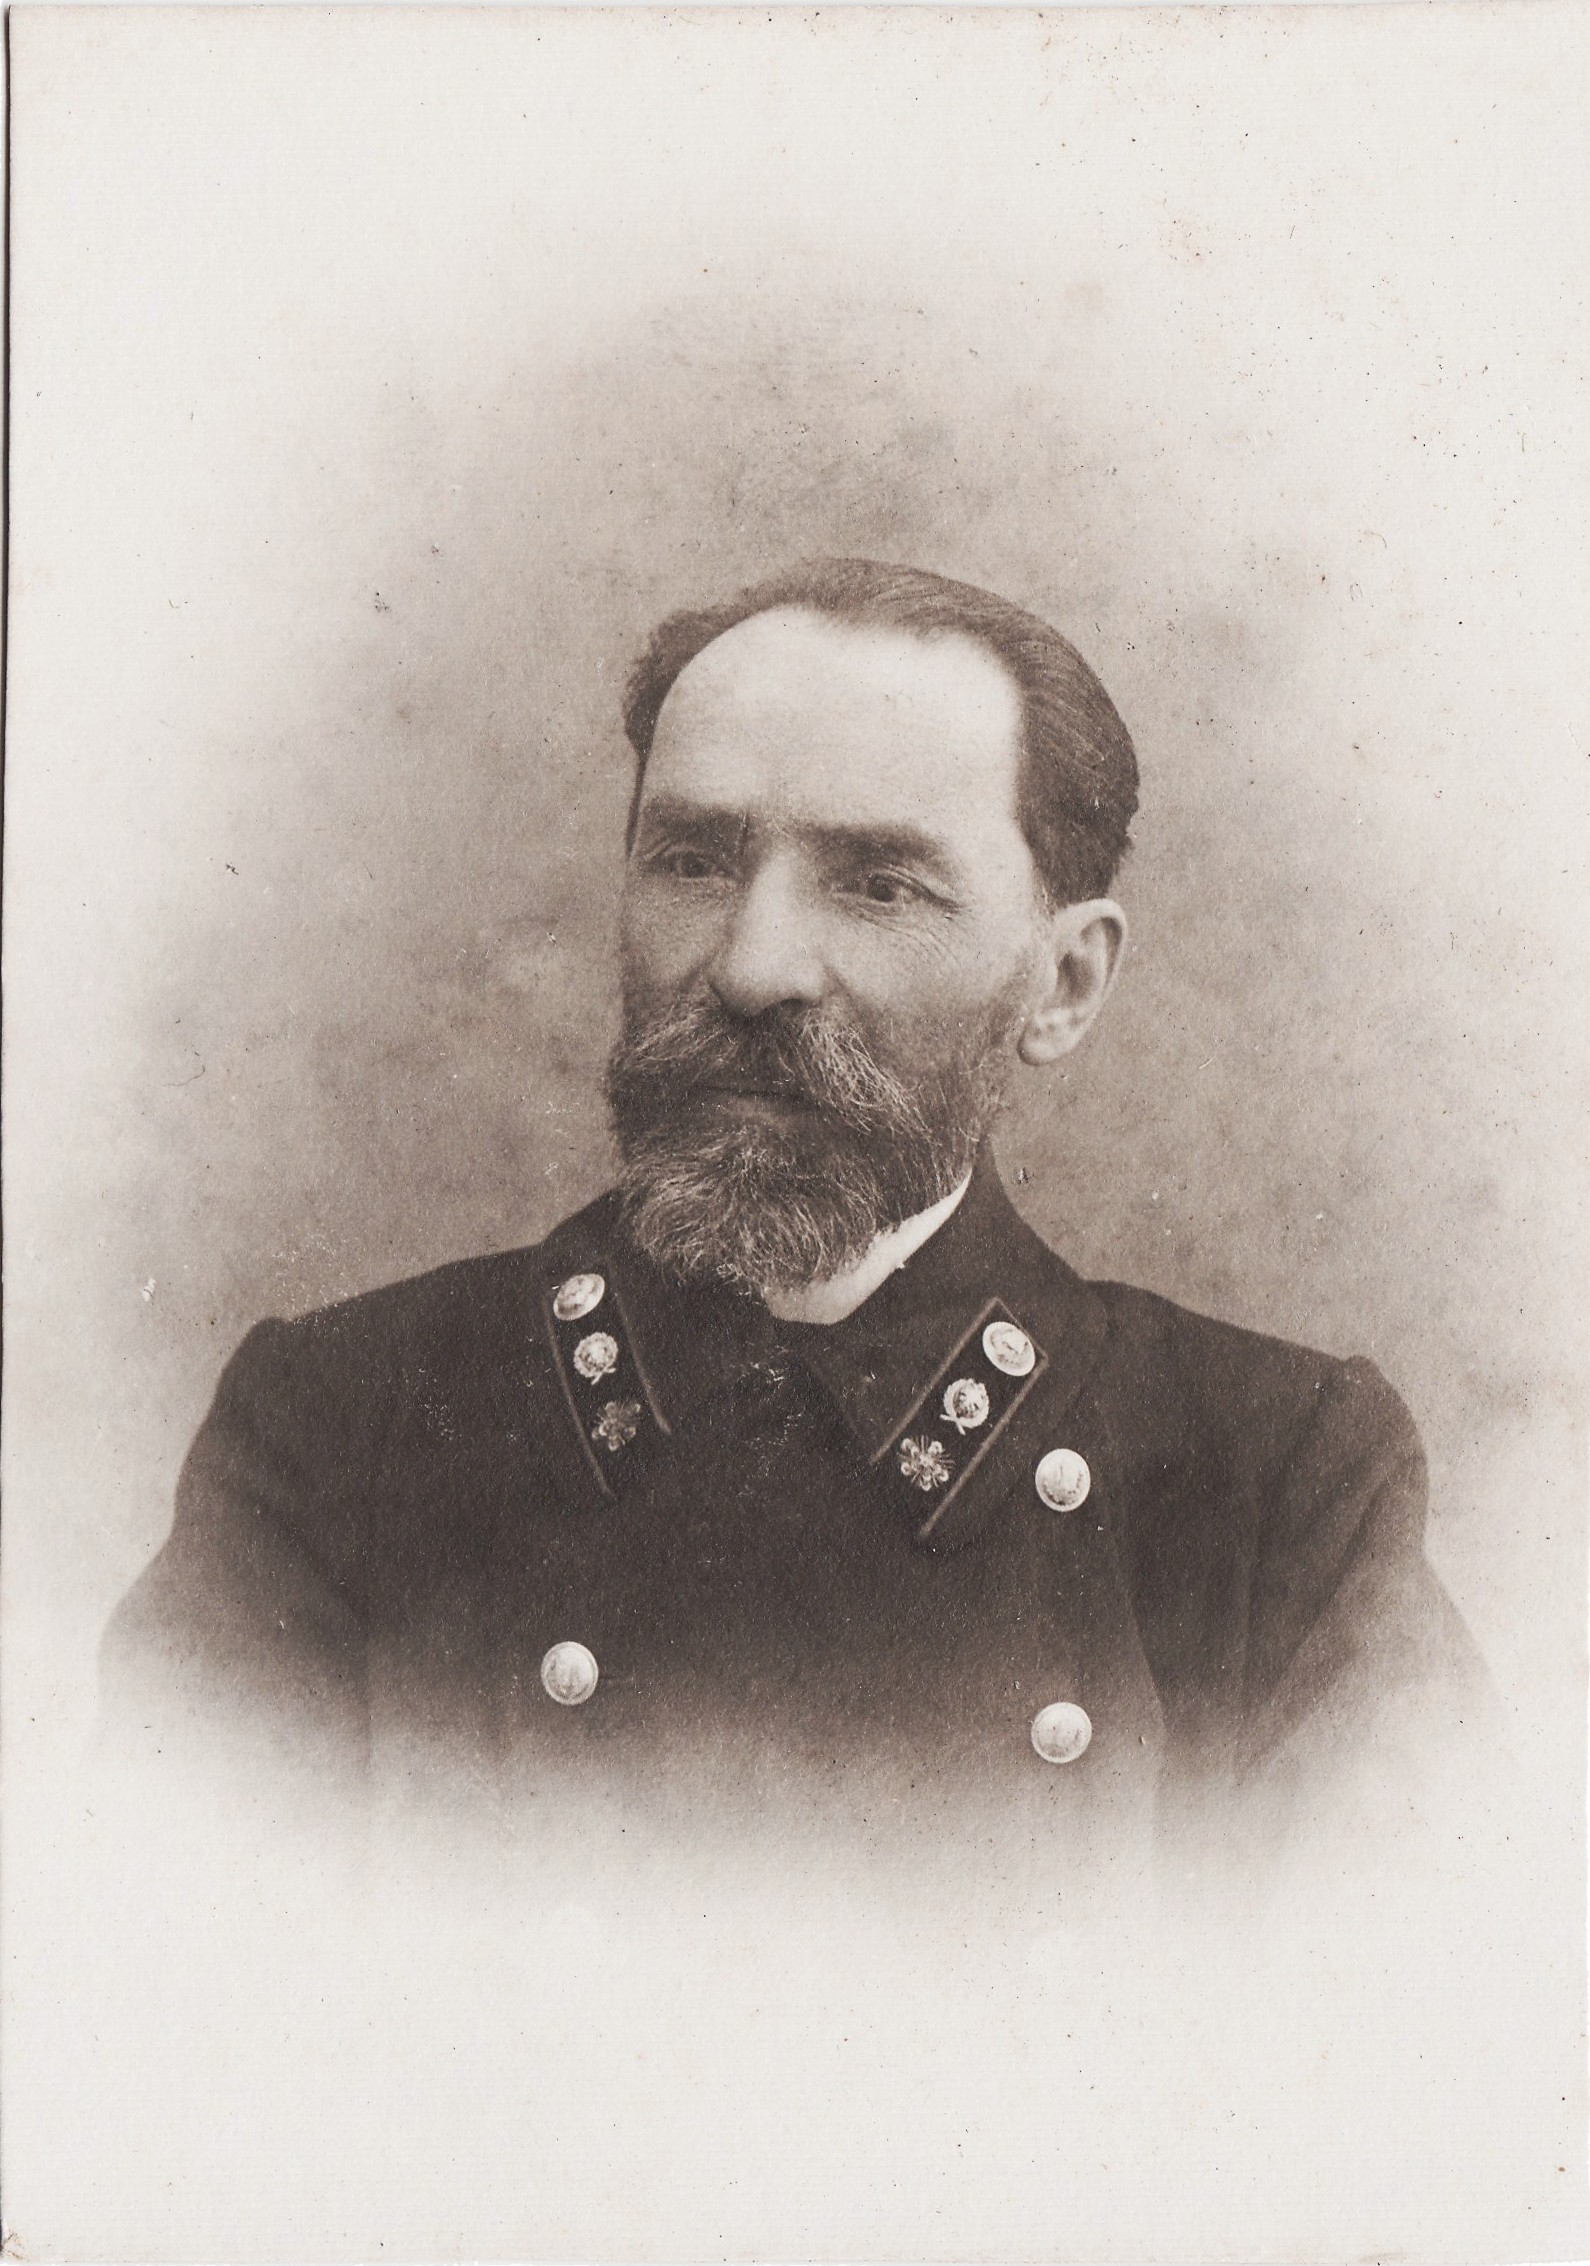 Гребановский Михаил Александрович, статский советник – математика и физика